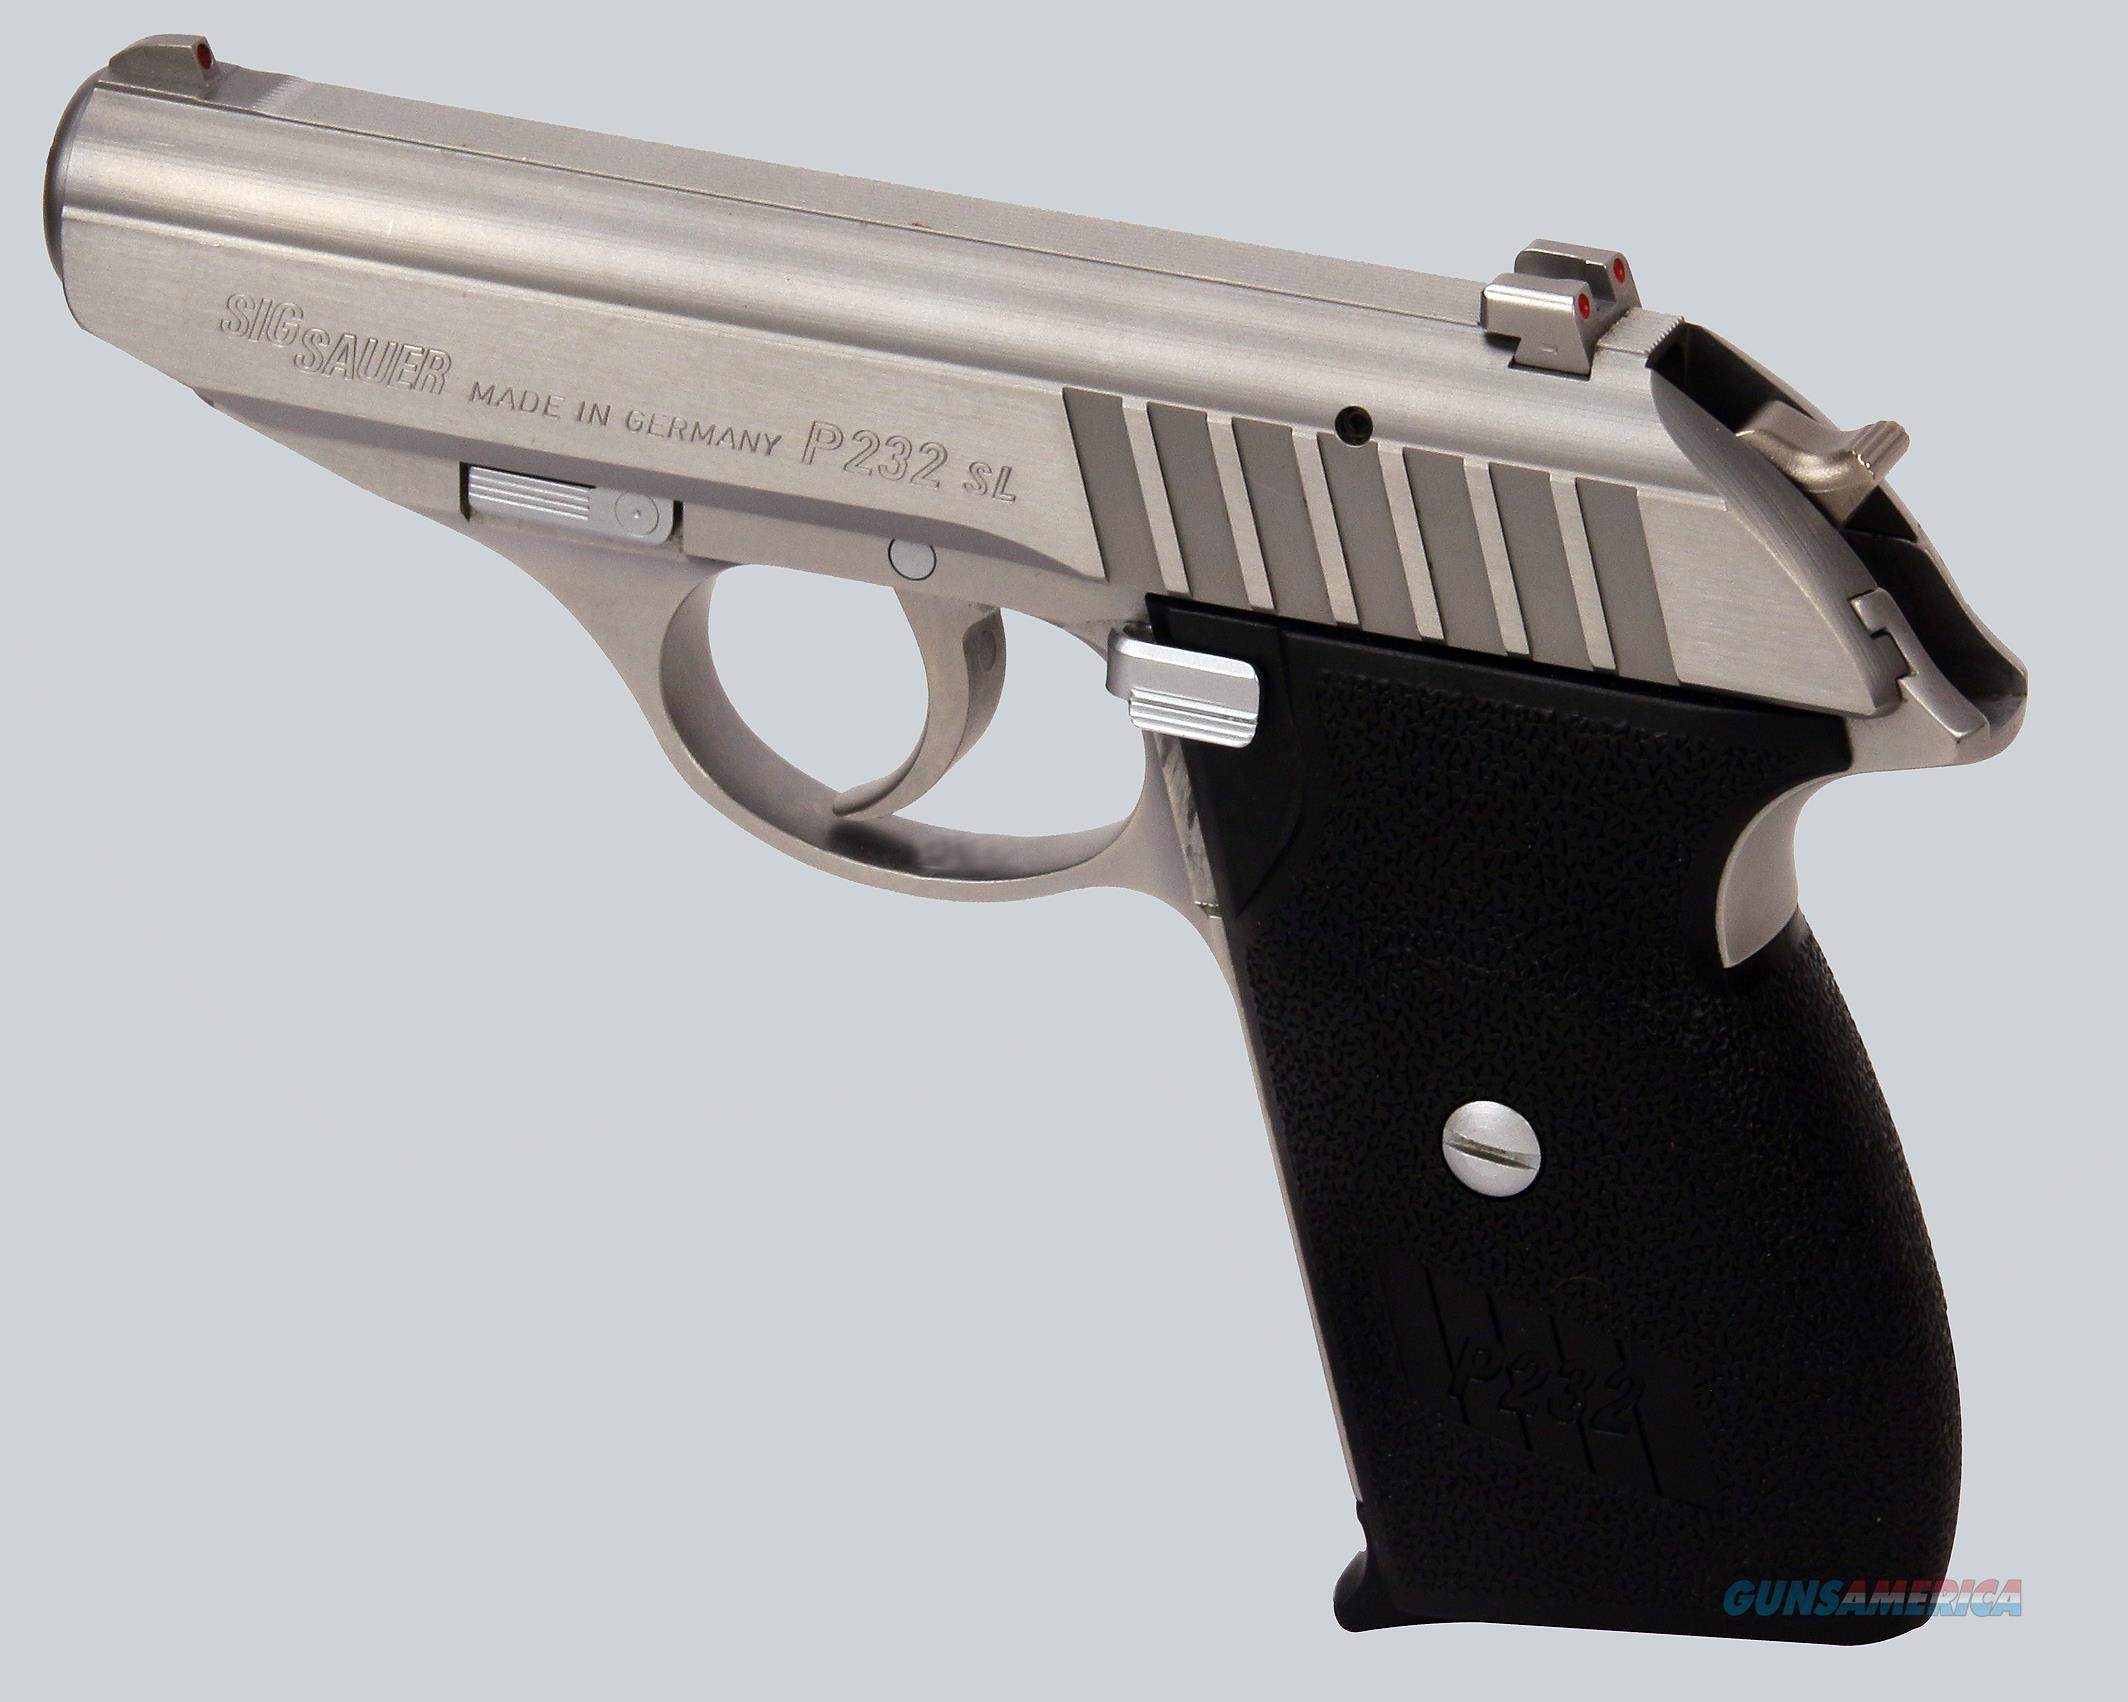 Sig Sauer 380acp P232 Pistol  Guns > Pistols > Sig - Sauer/Sigarms Pistols > P232